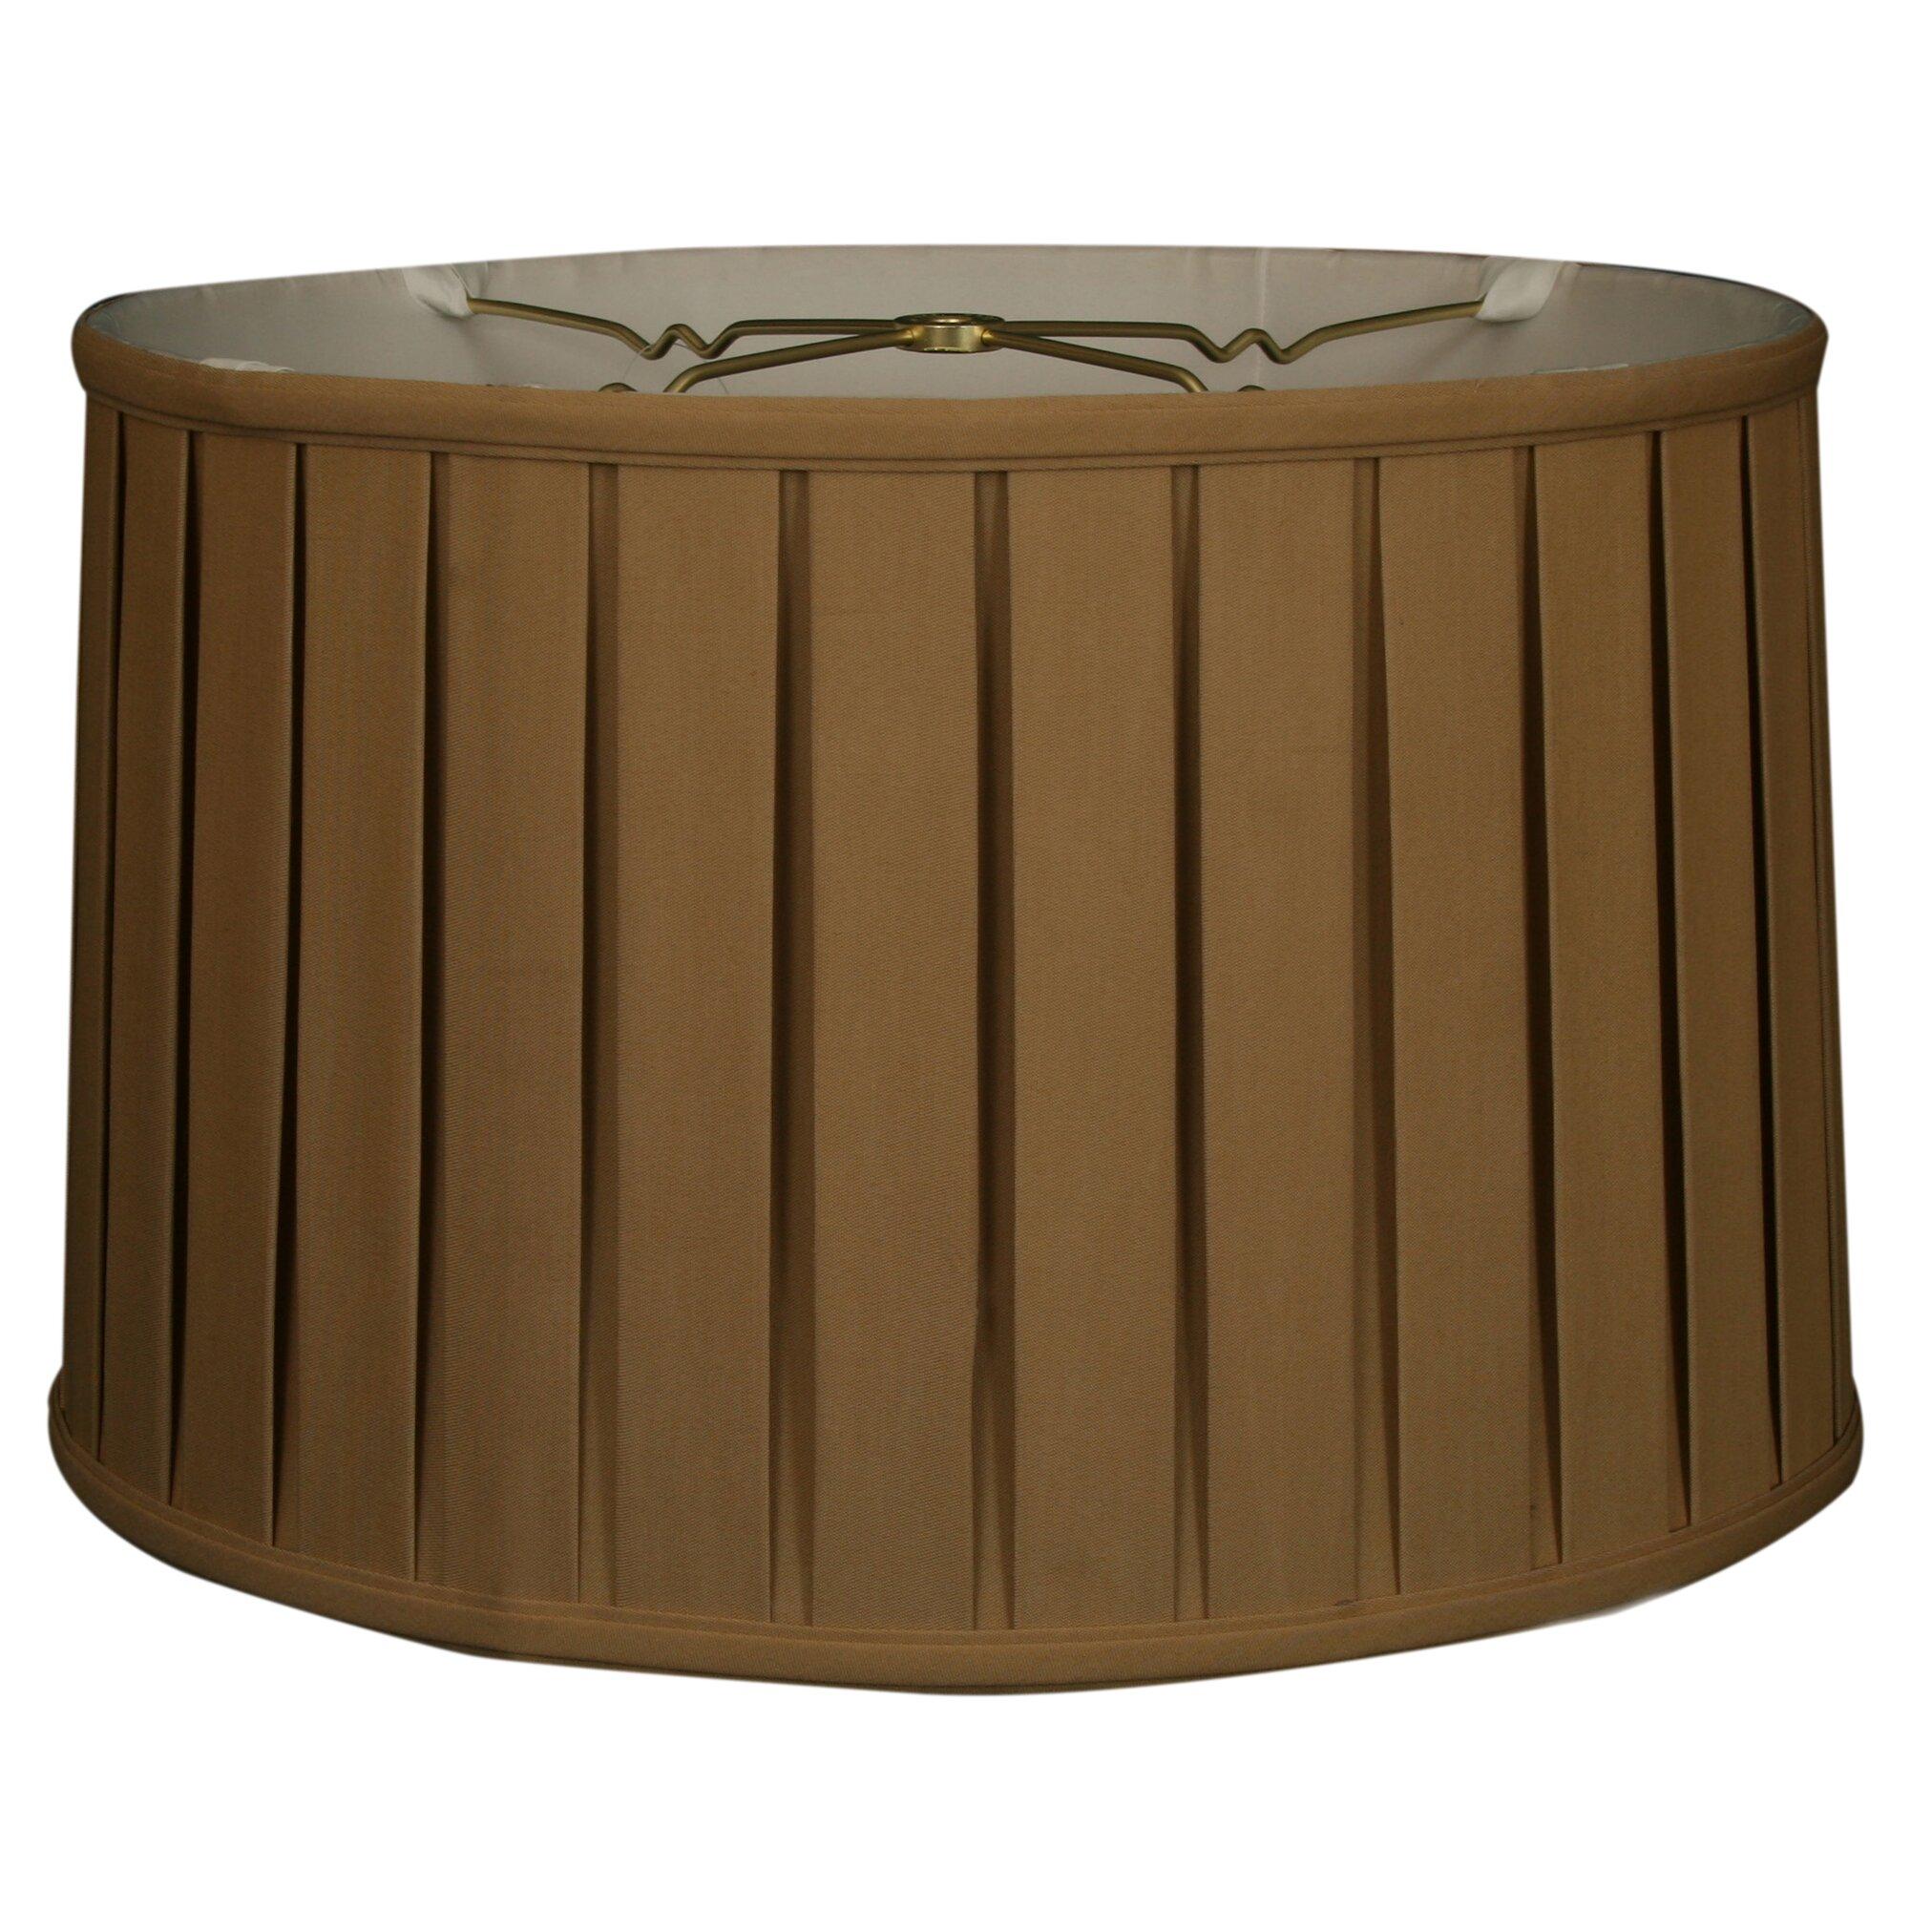 18 timeless silk drum lamp shade wayfair. Black Bedroom Furniture Sets. Home Design Ideas